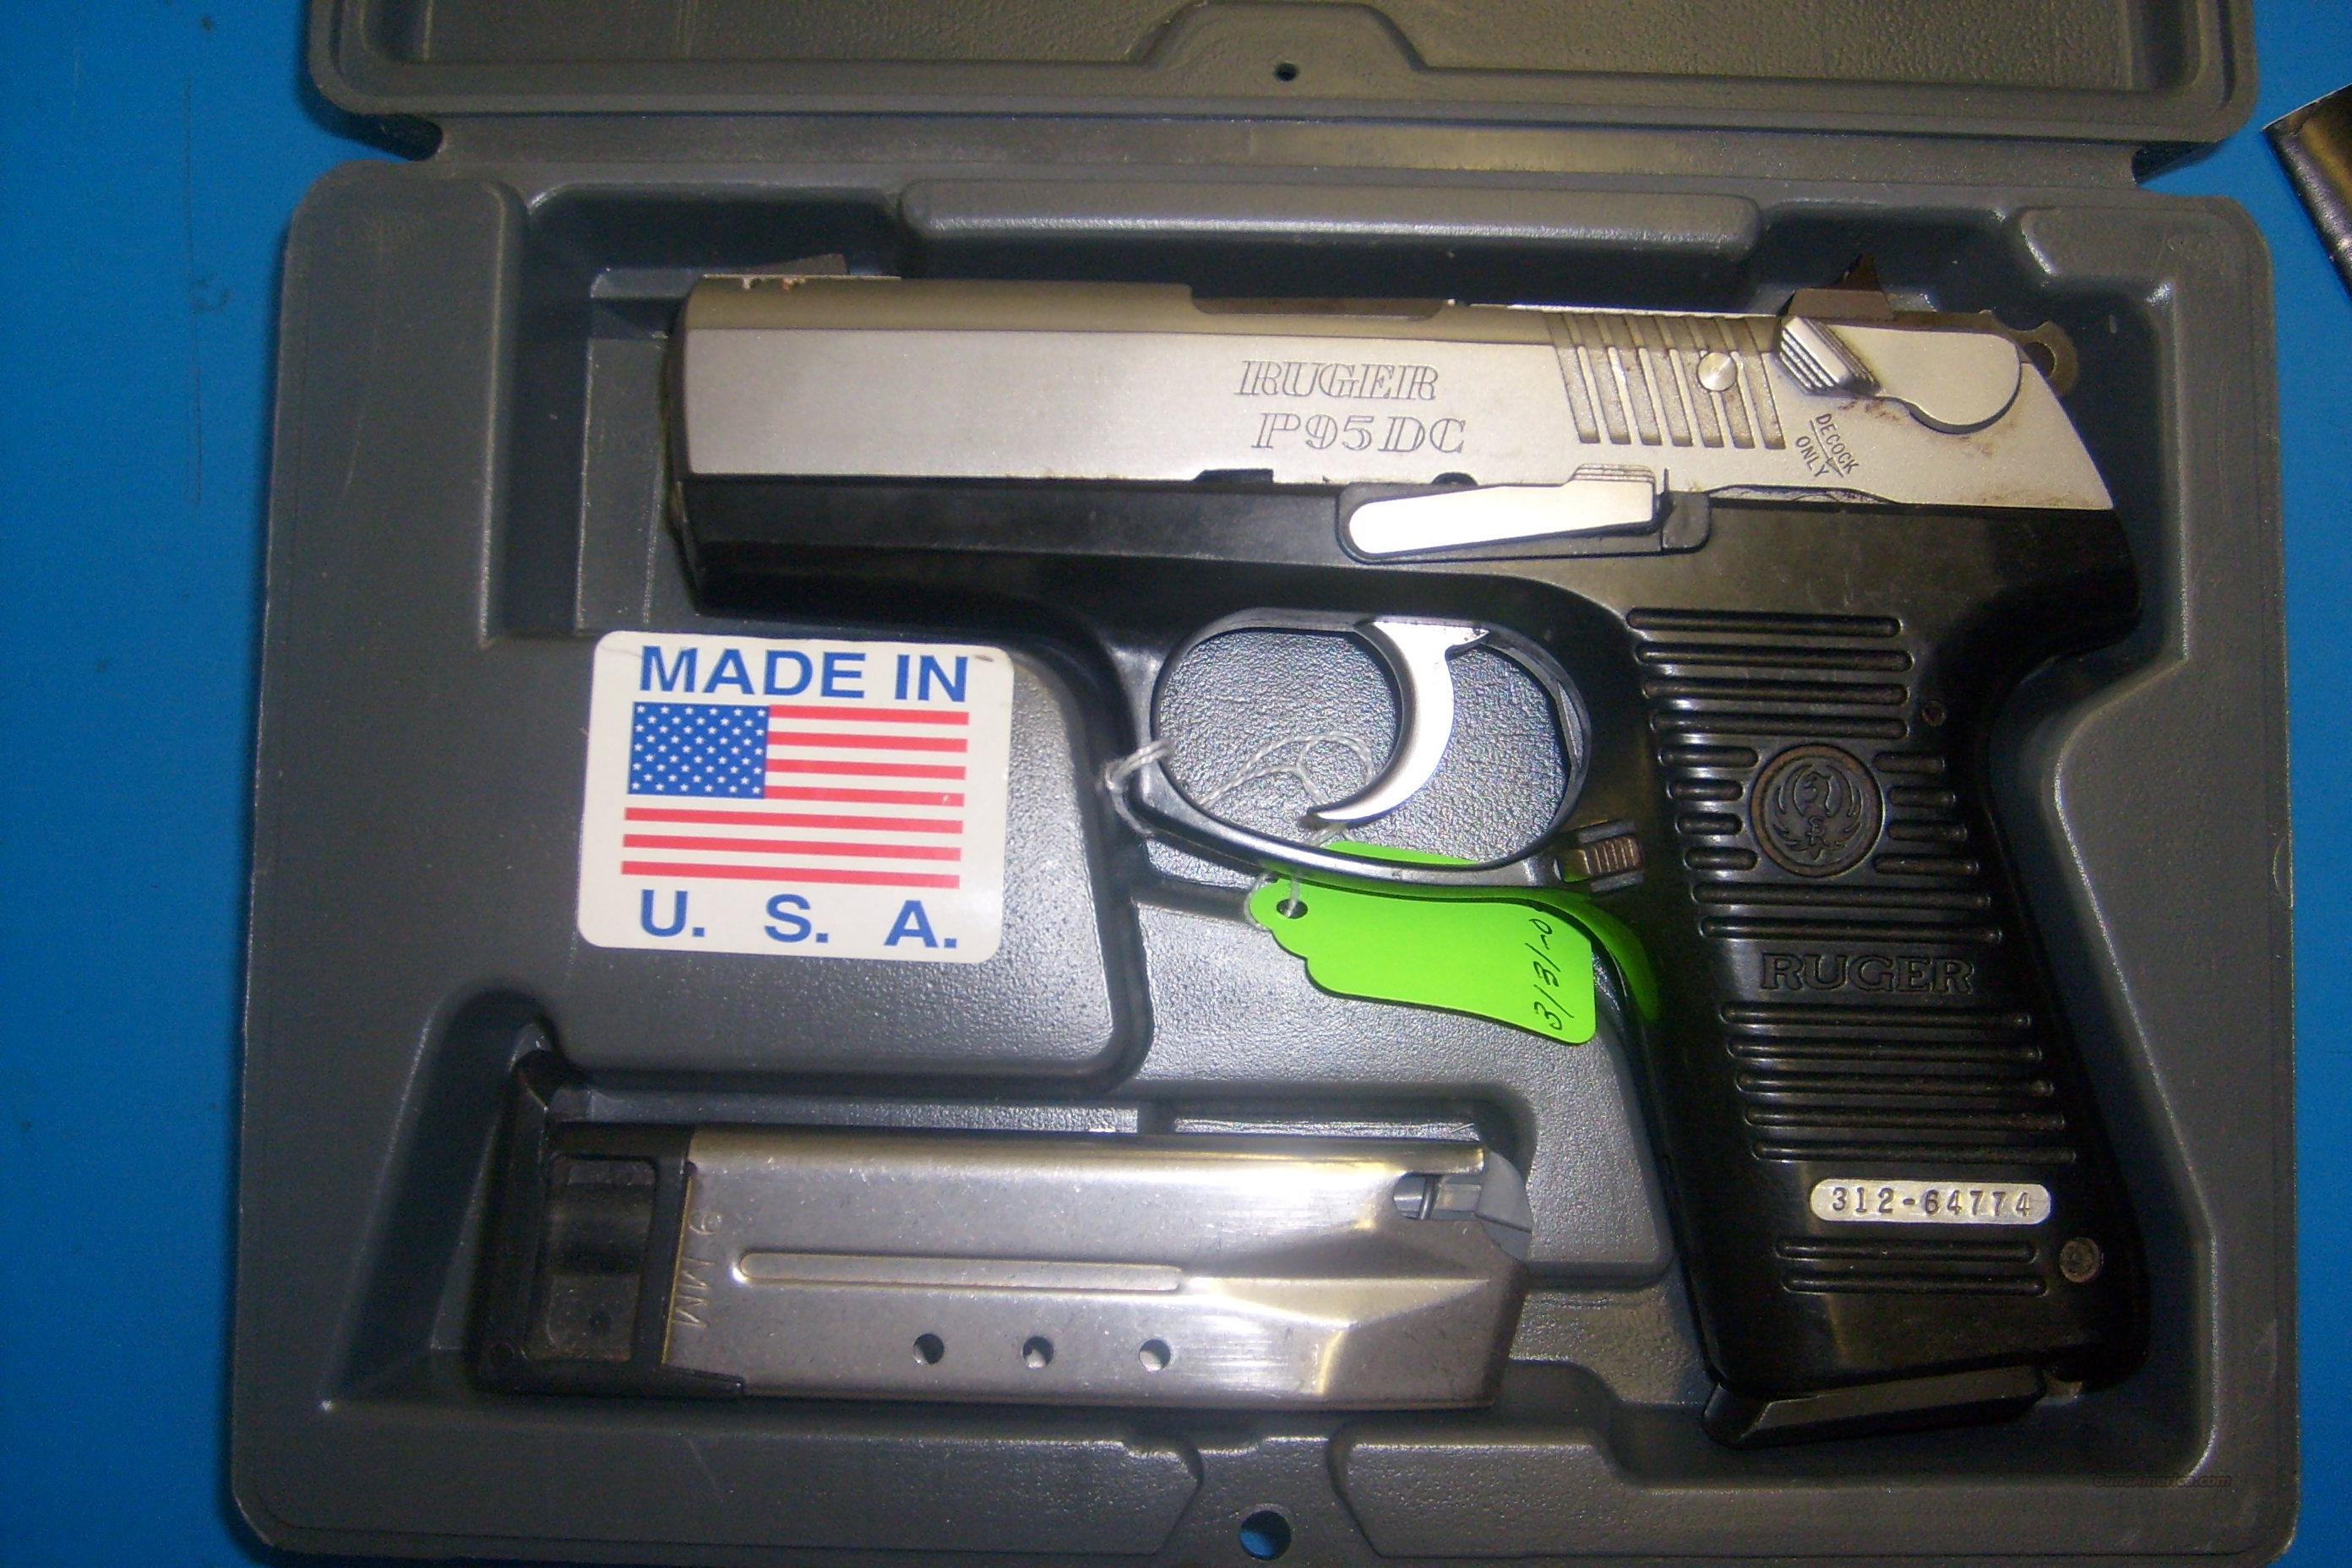 Ruger P95dc 9mm Caliber For Sale